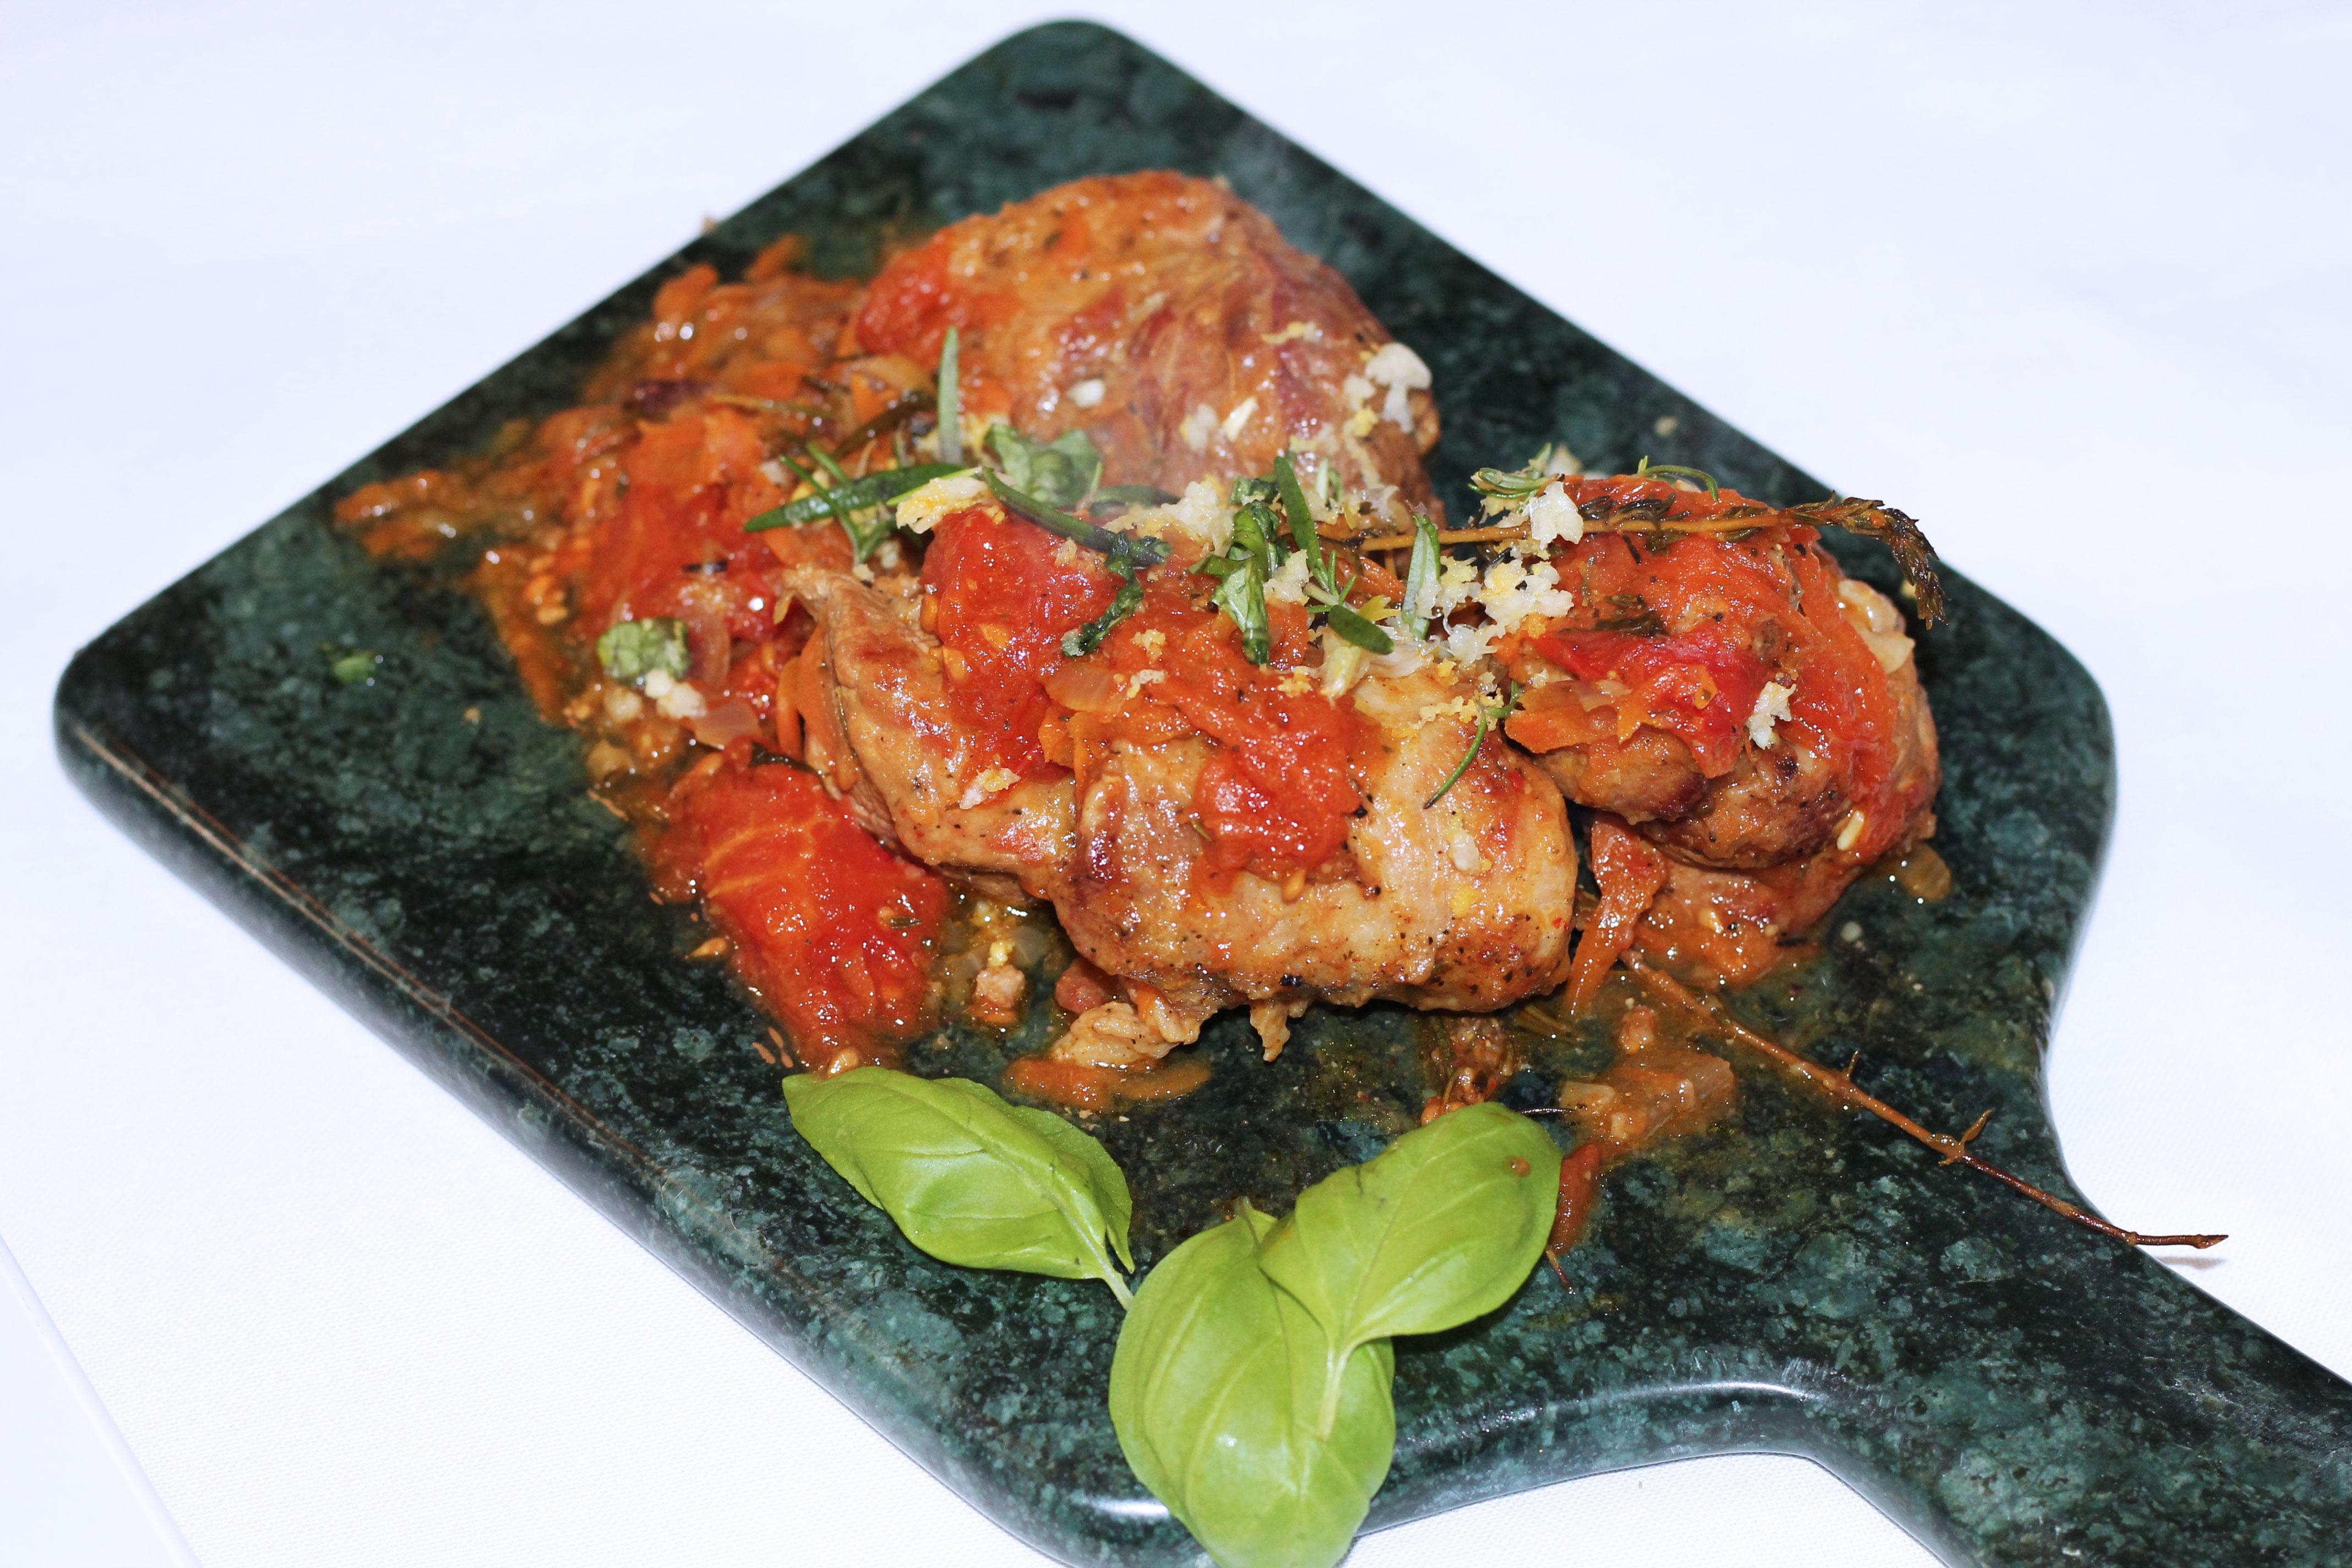 7-geschmackswelten-food-blogparade-italien-kulinarische-momente-italia-italy-rezept-gericht-kardiaserena-ossobuco-alla-milanese